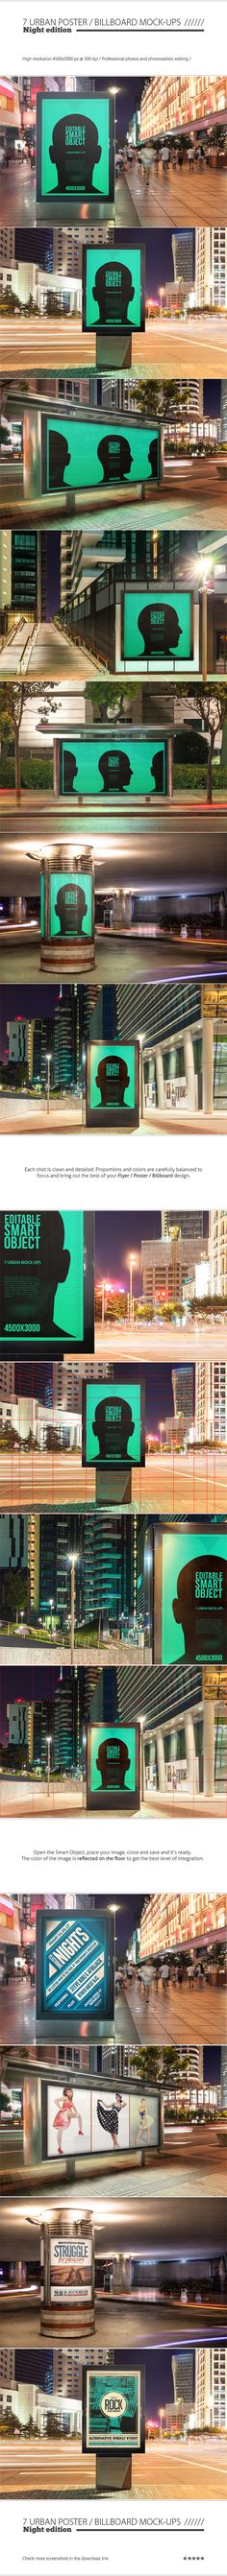 Urban Flyer / Poster / Billboard MockUp - Night Edition by Nuwan Panditha, via Behance